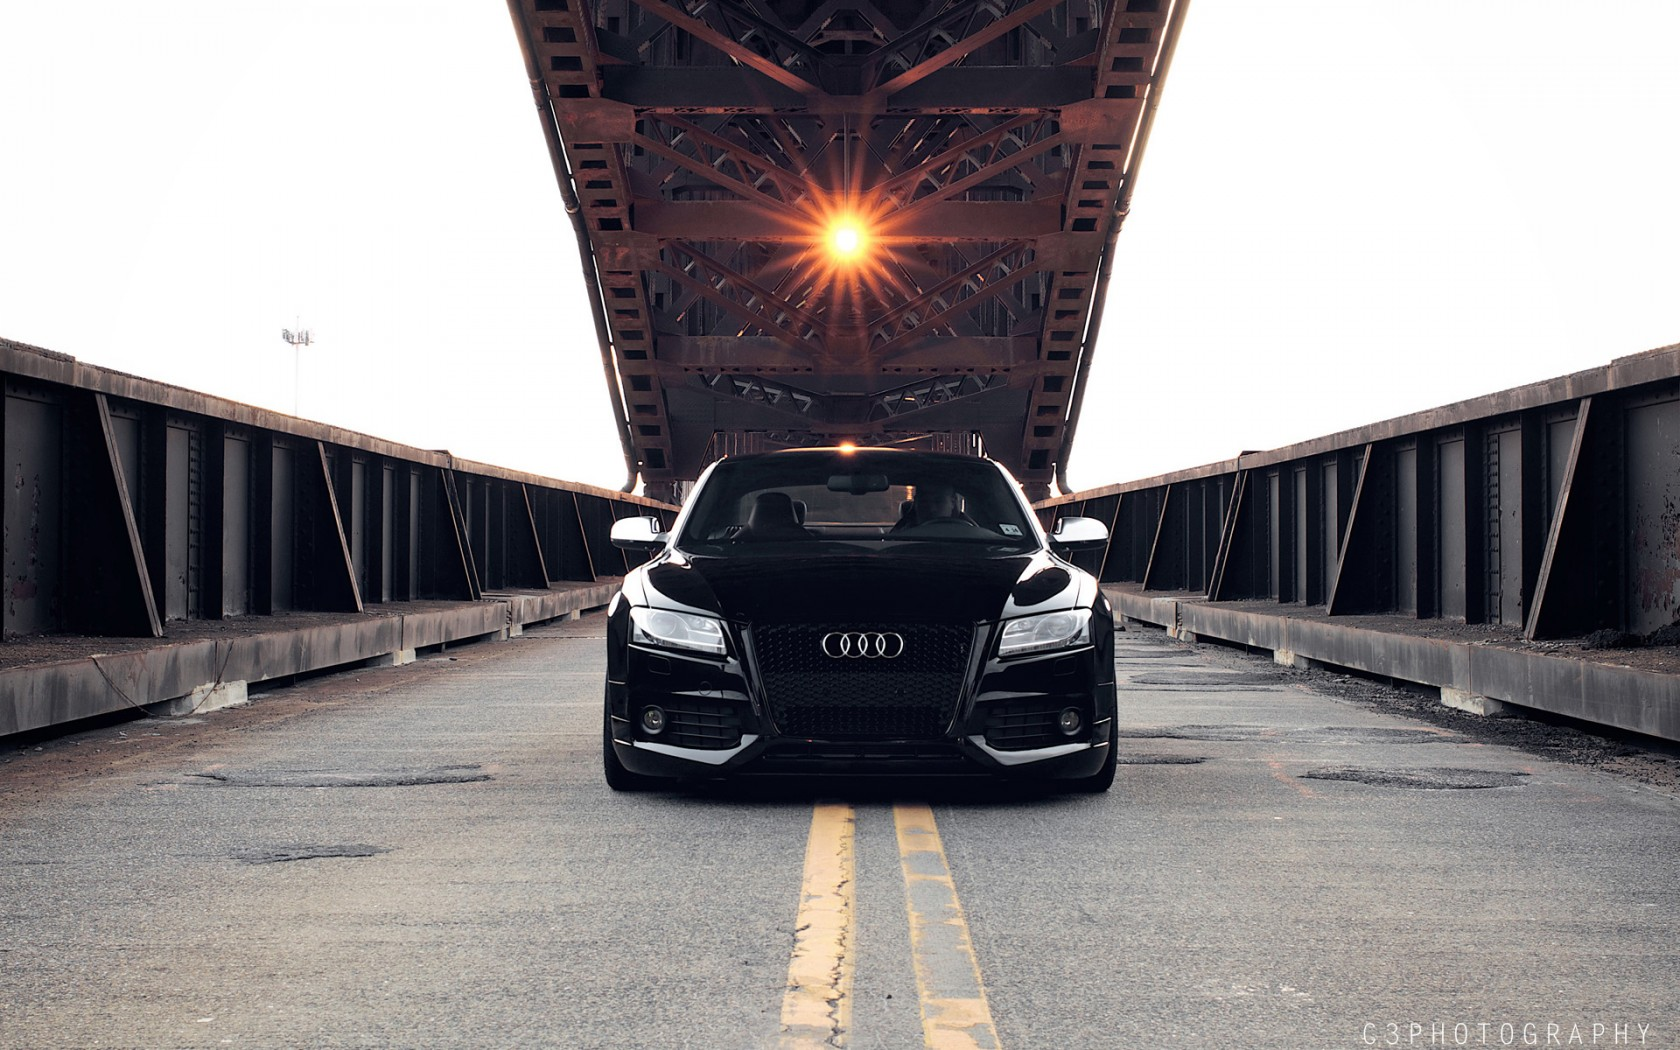 Black Audi S5 Wallpaper | HD Car Wallpapers | ID #2597